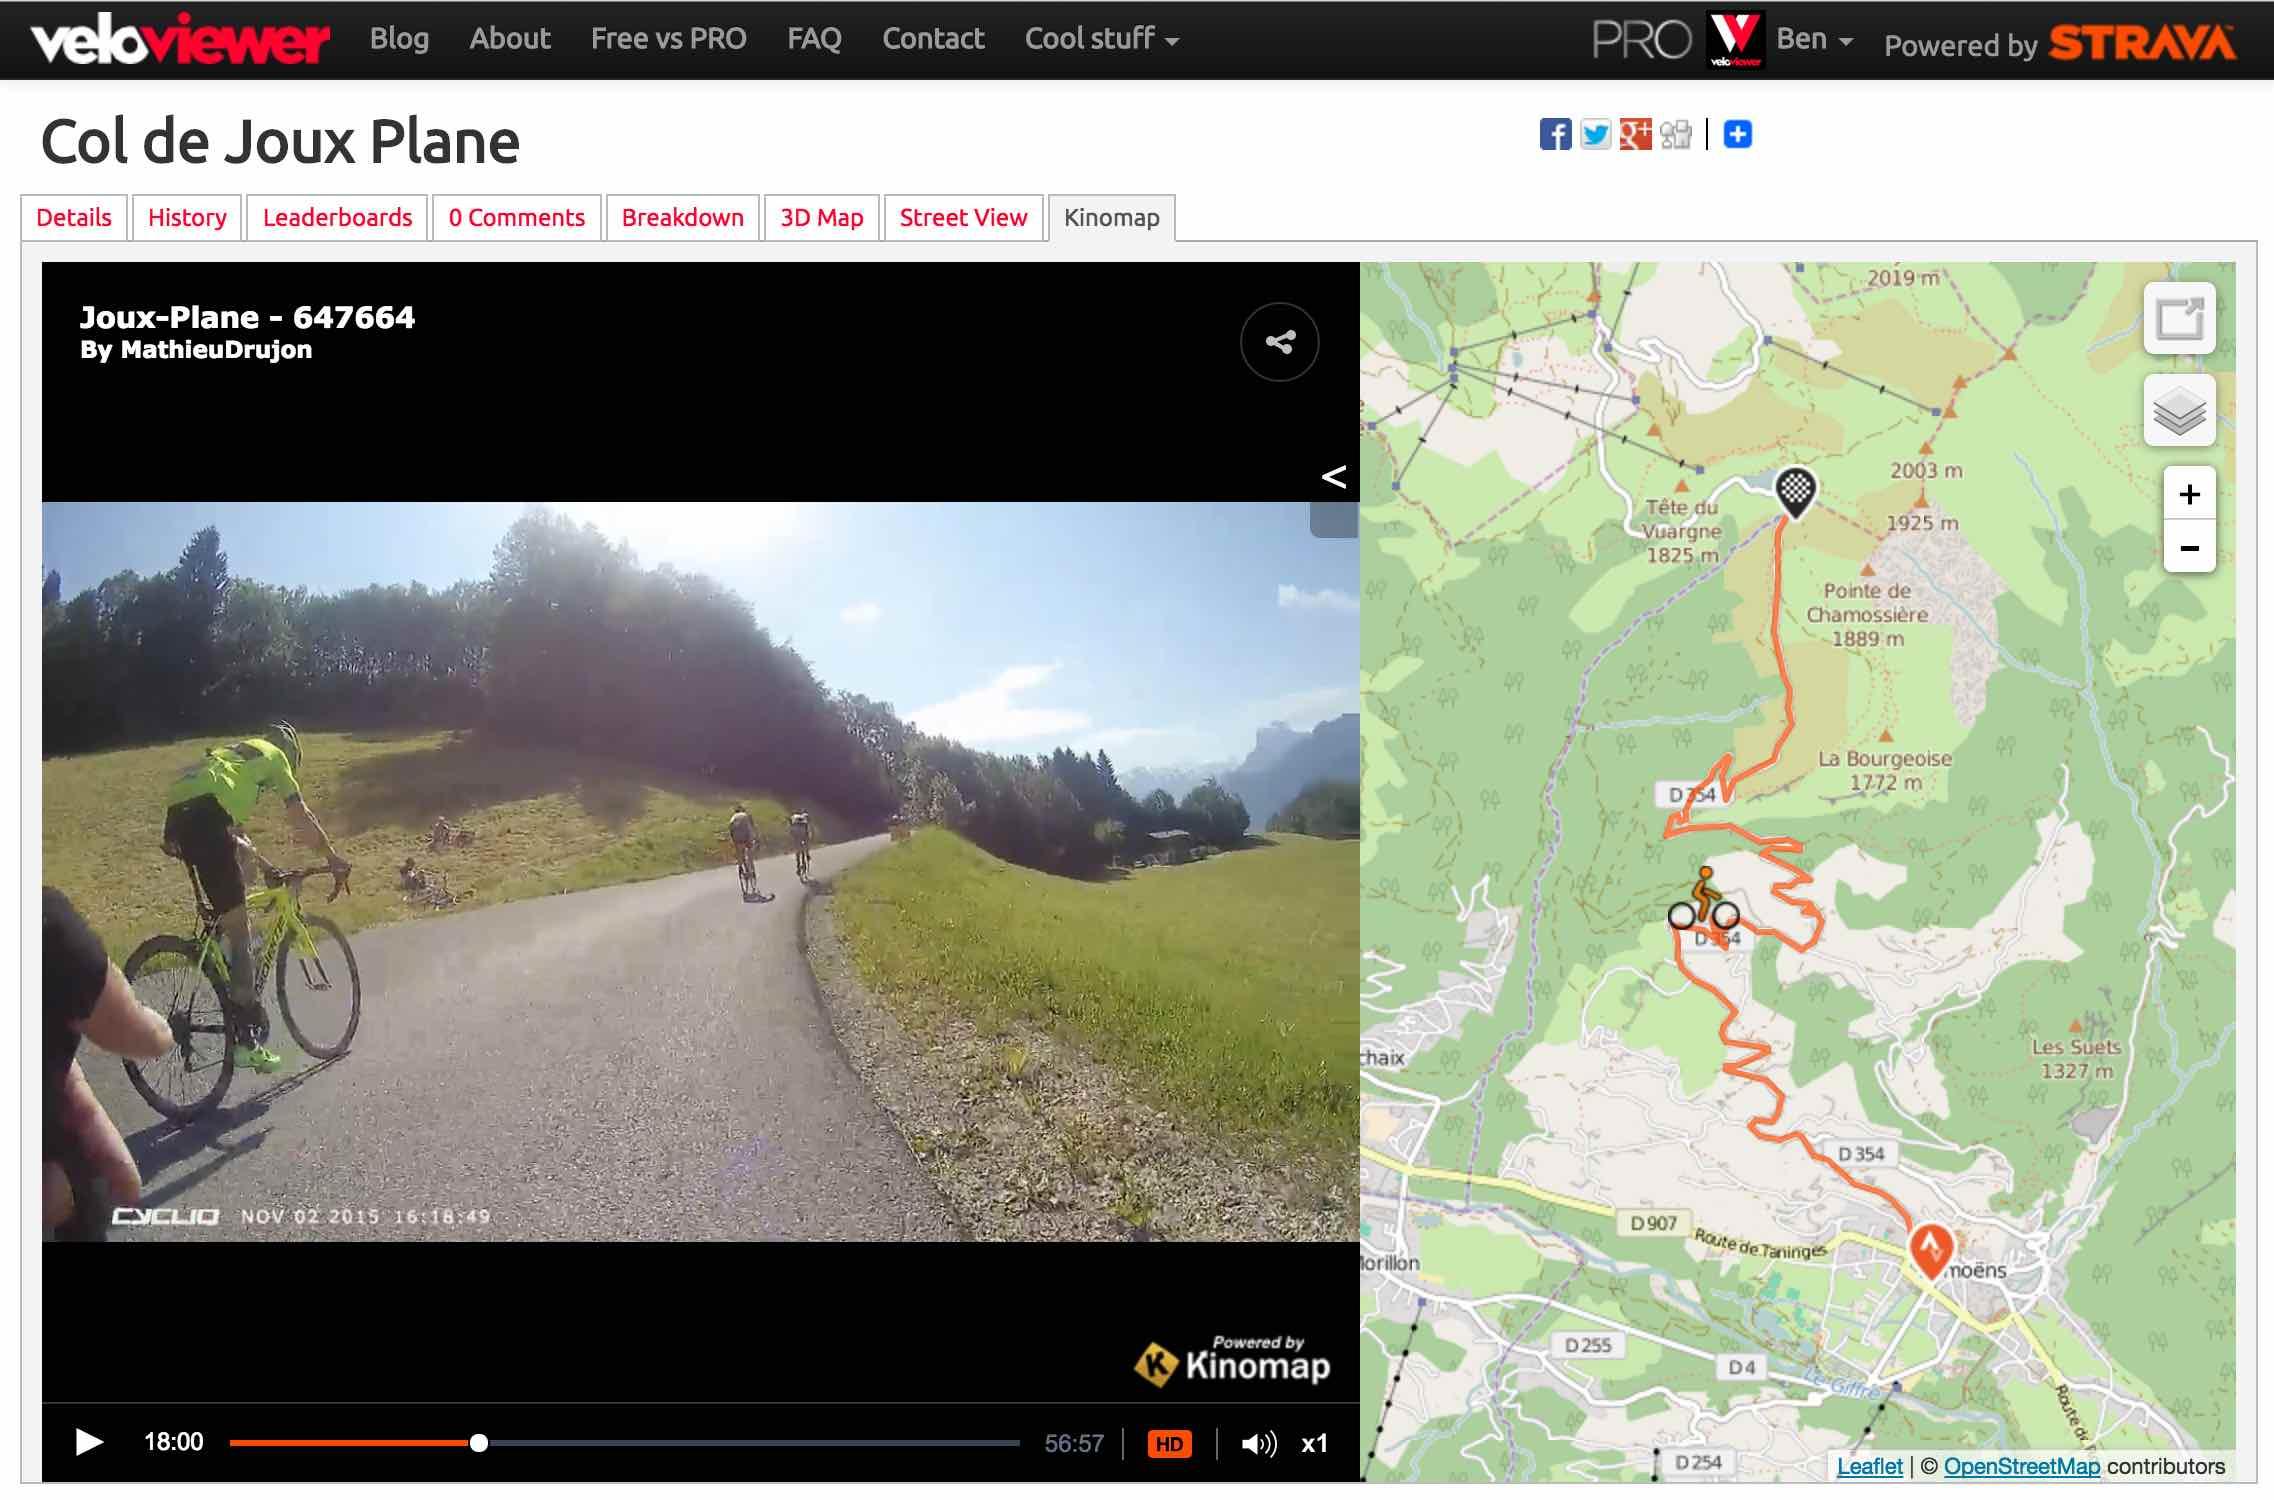 Kinomap Video Integration for Strava Segments on VeloViewer